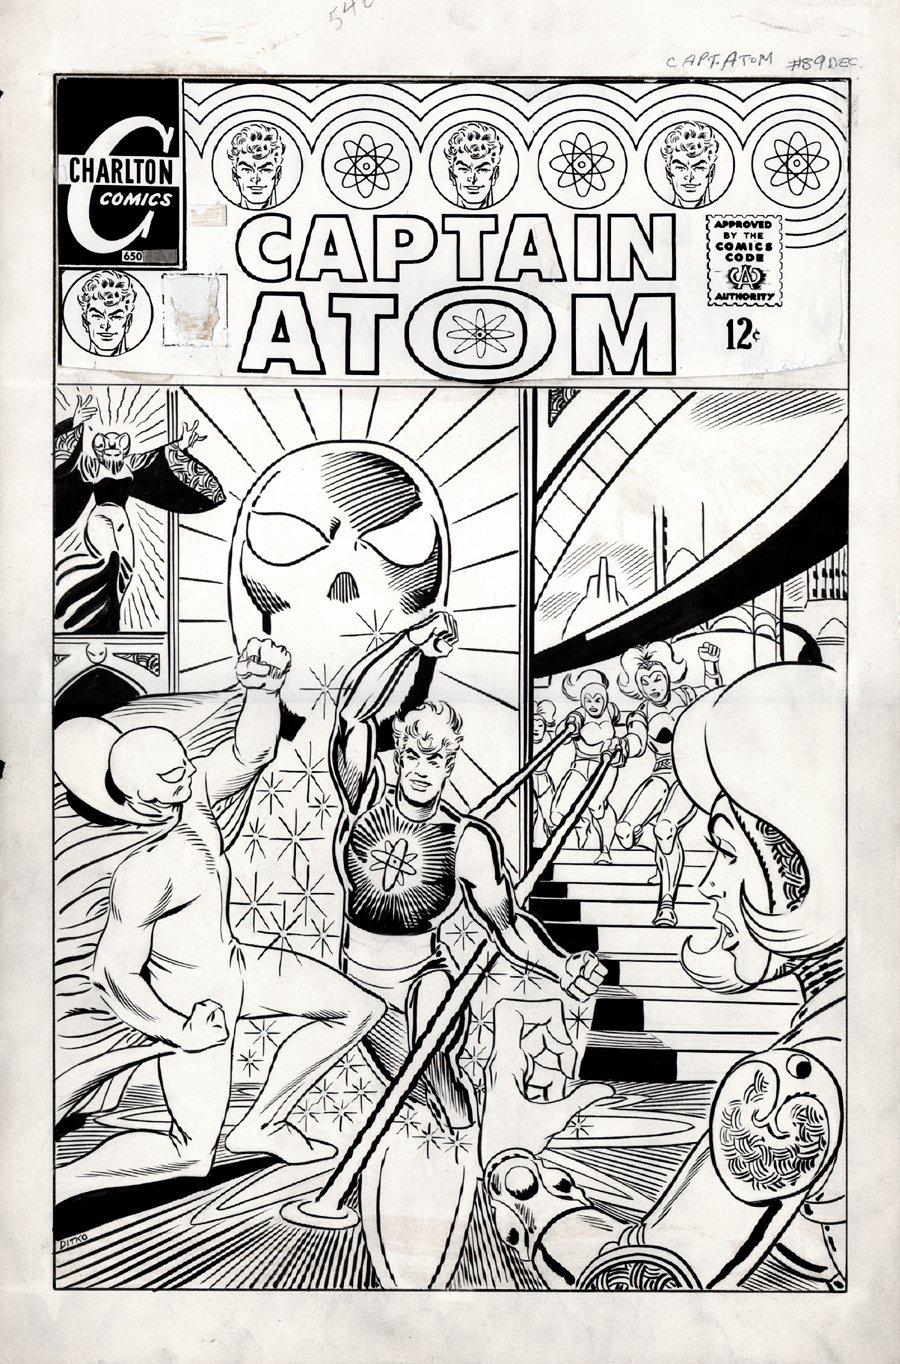 Captain Atom #90 Cover (LARGE ART) 1967